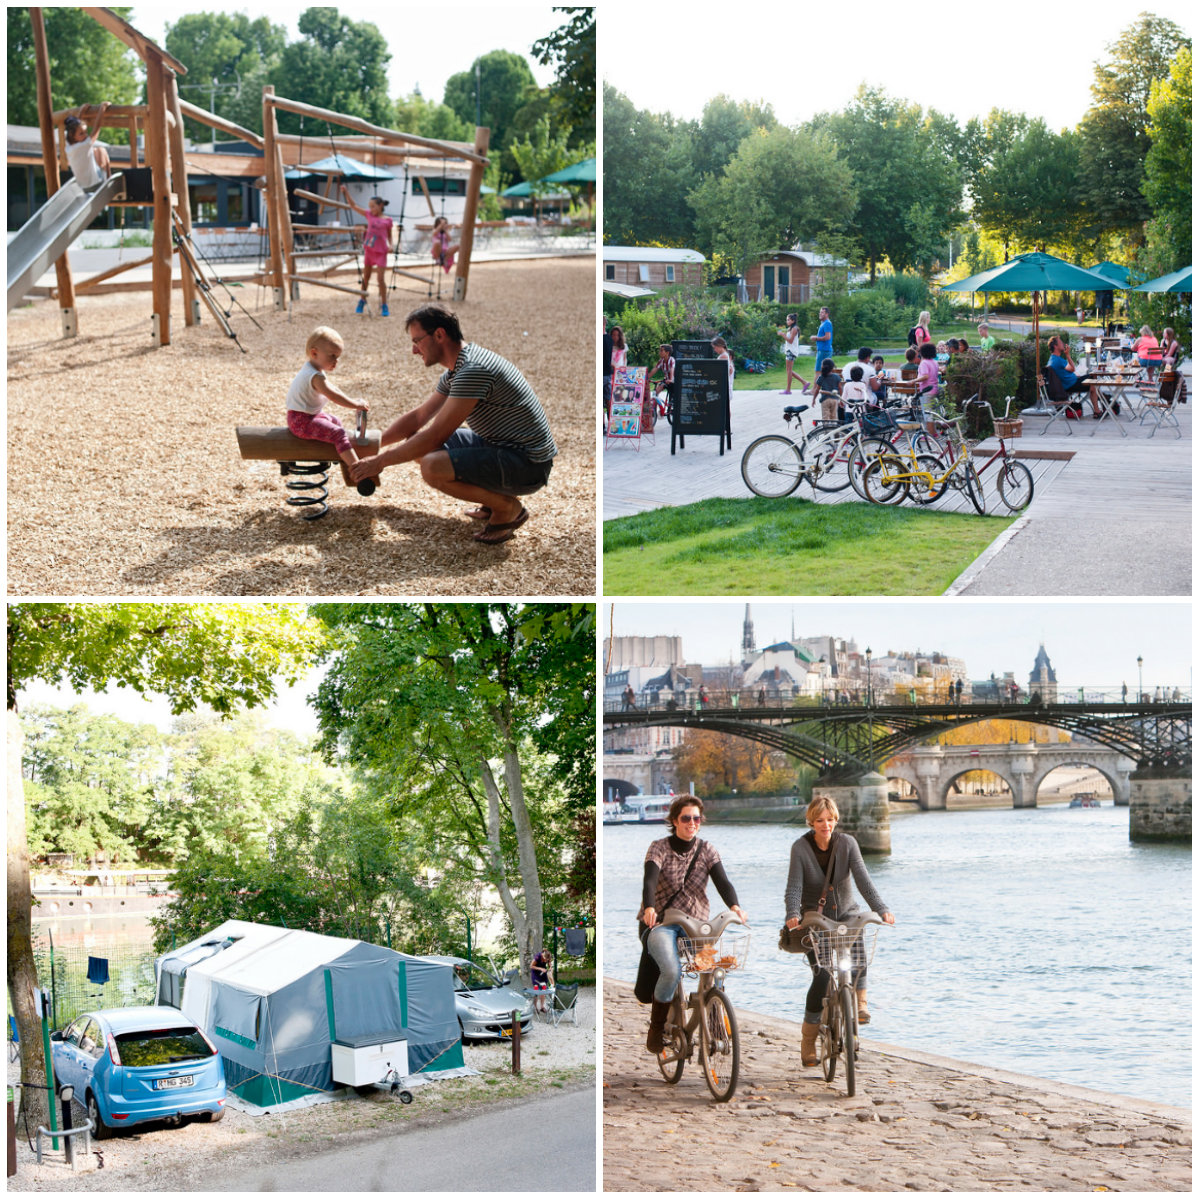 Indigo camping Bois de Boulogne bij in Parijs